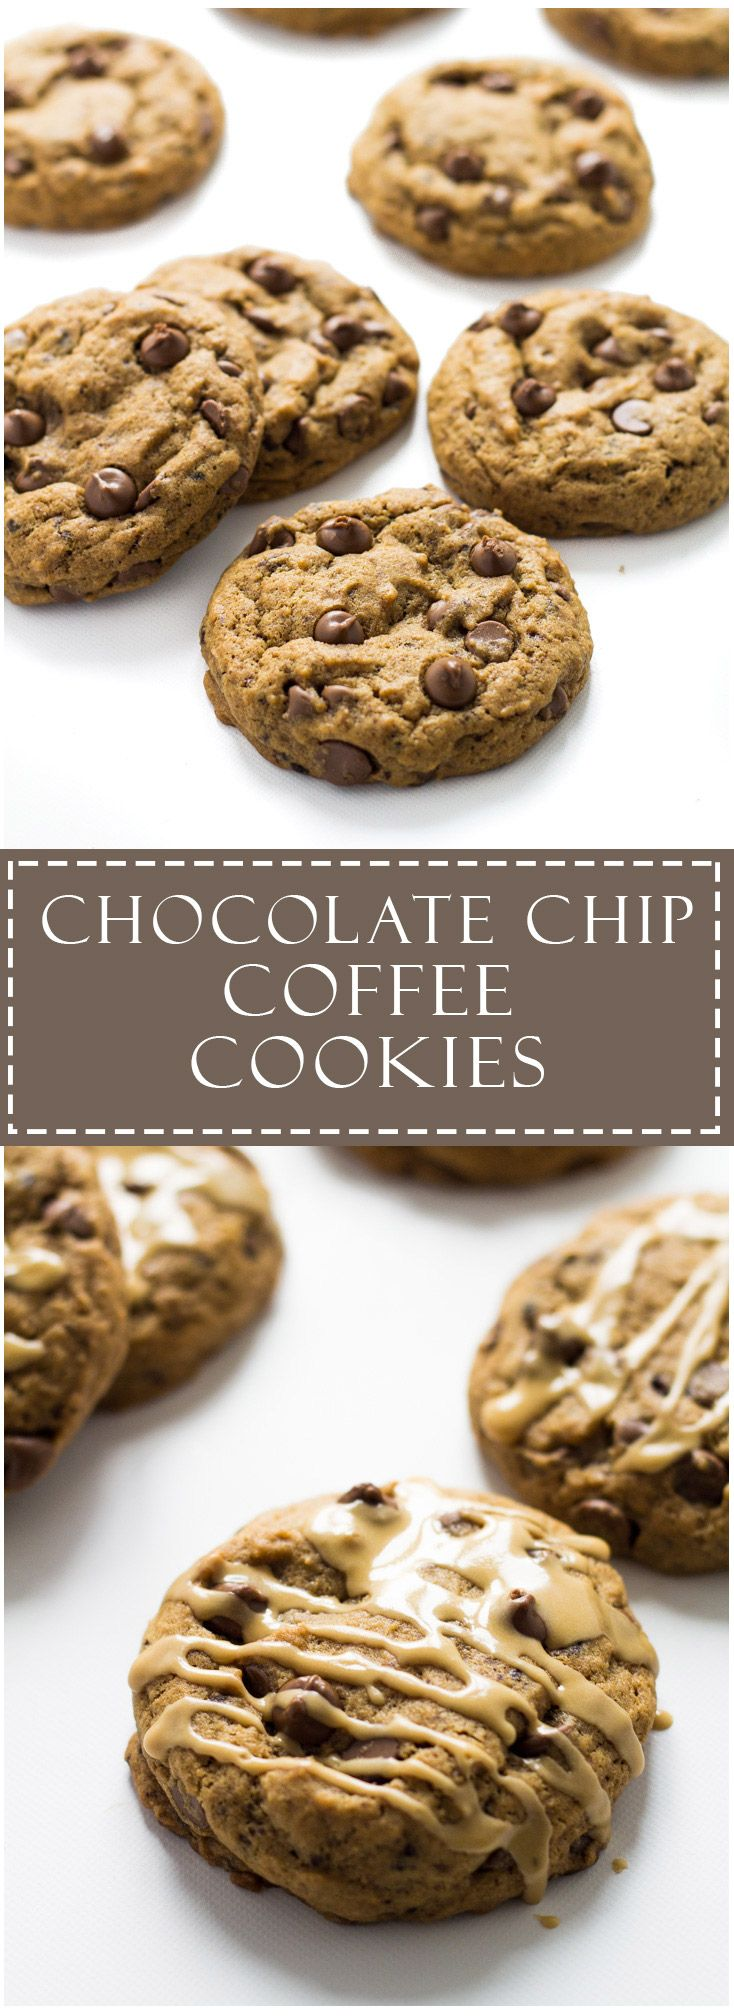 Chocolate Chip Coffee Cookies | Marsha's Baking Addiction